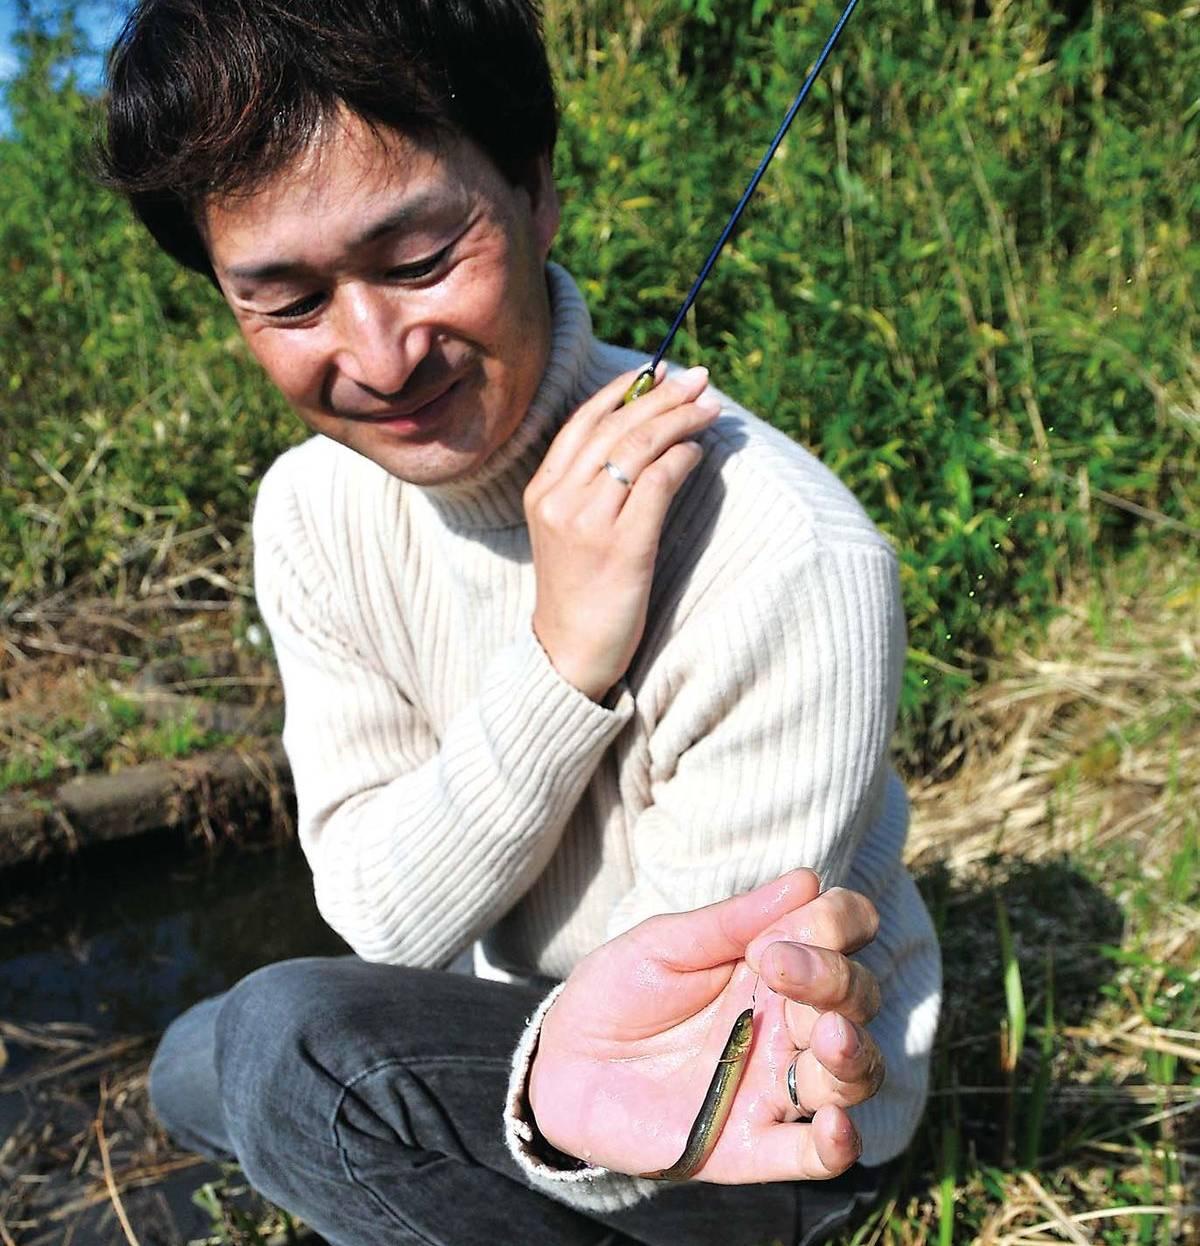 032-035higashiura_cs6 (21)